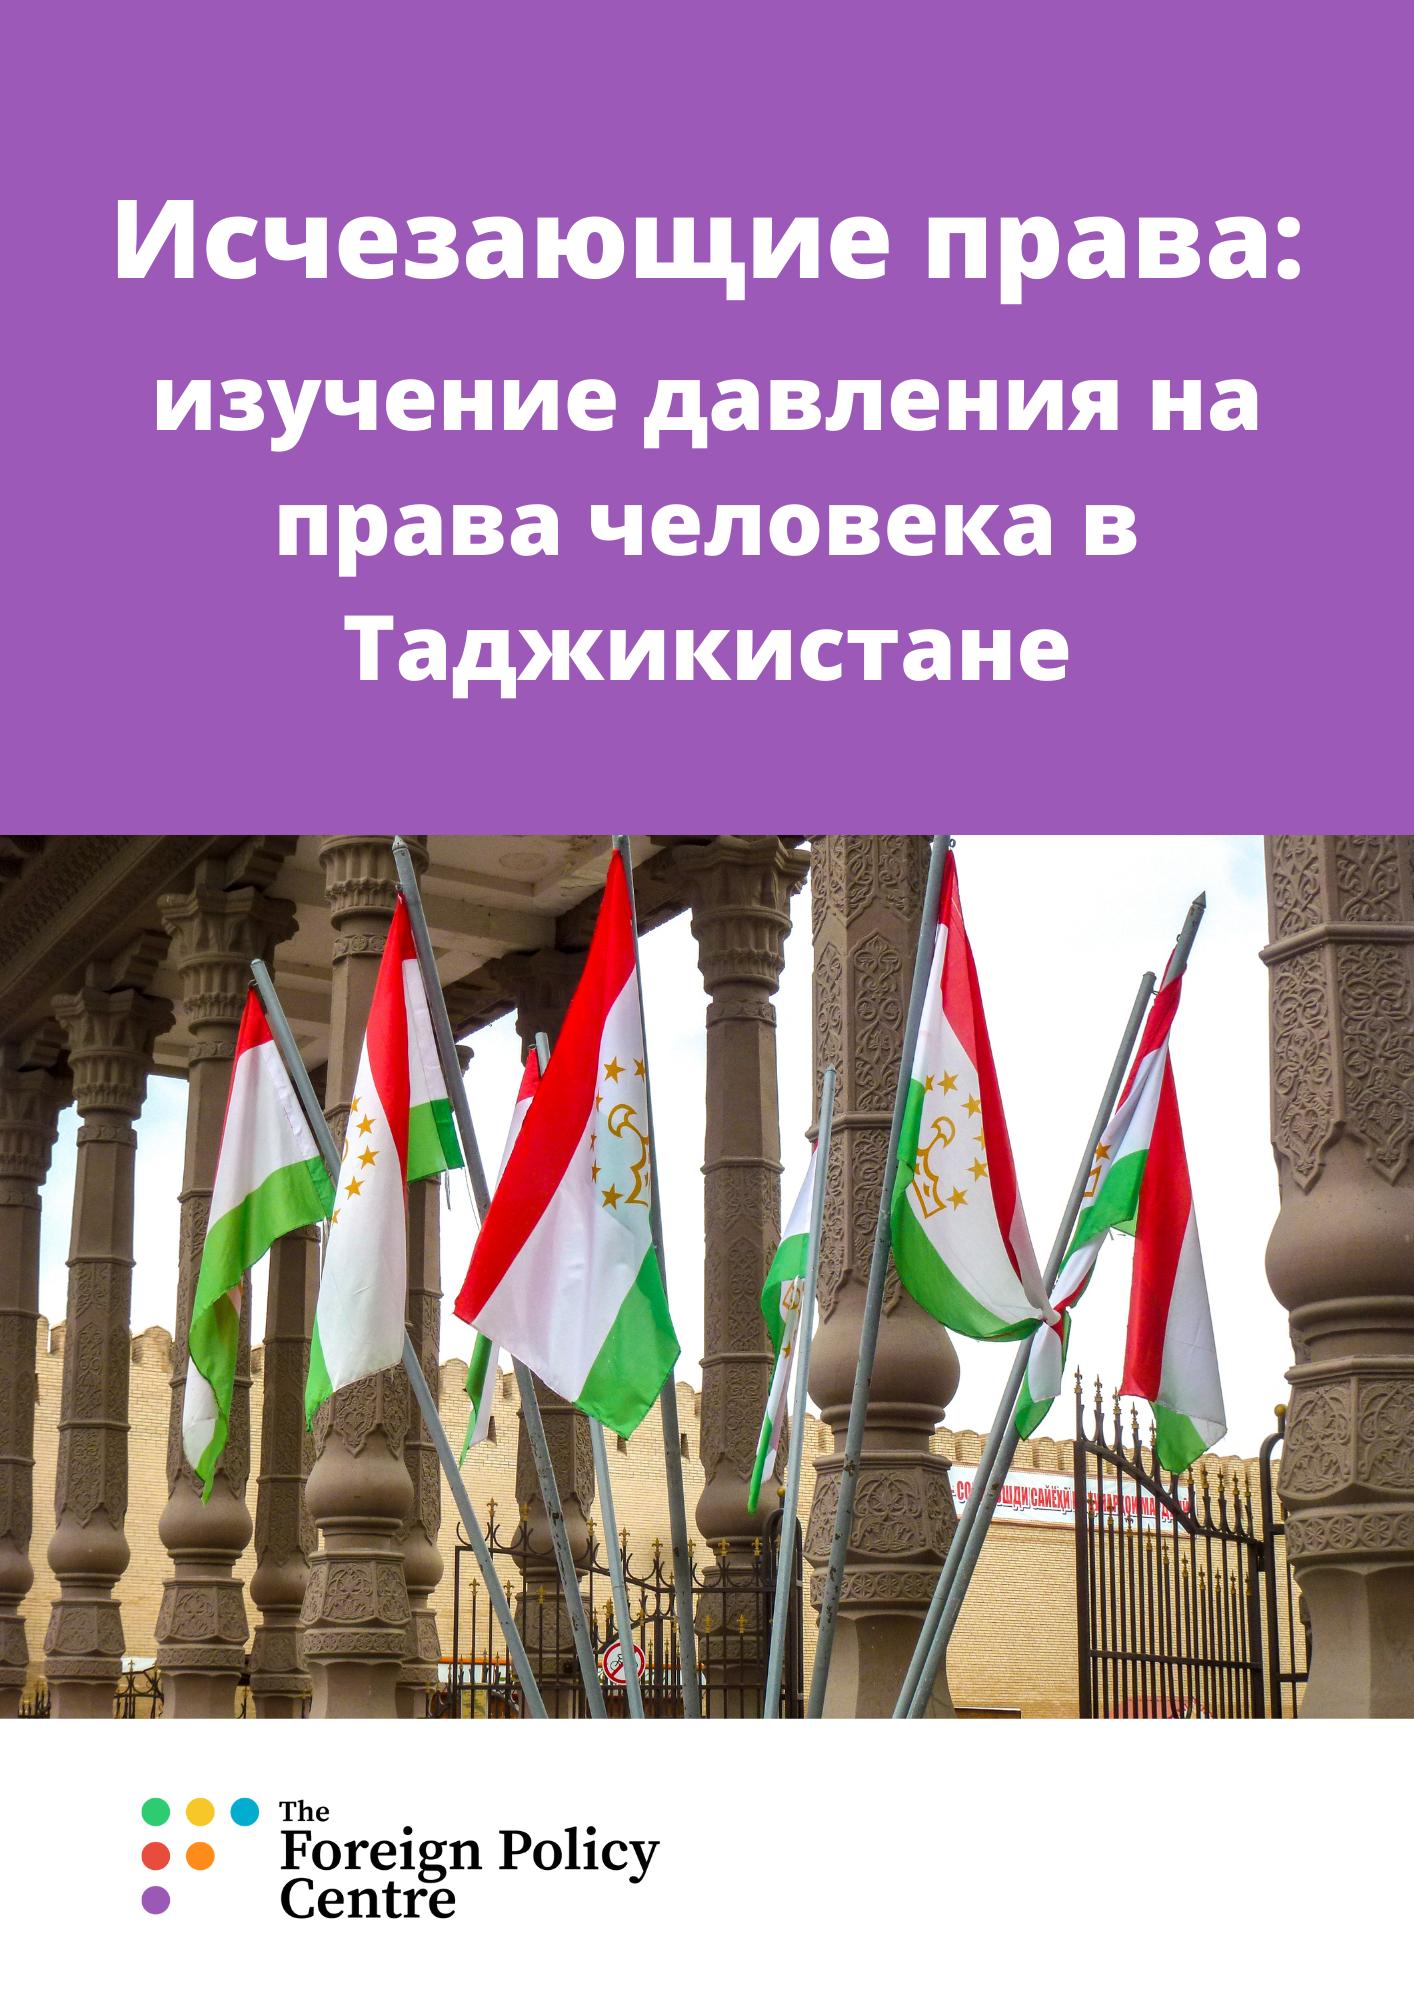 Исчезающие права: изучение давления на права человека в Таджикистане